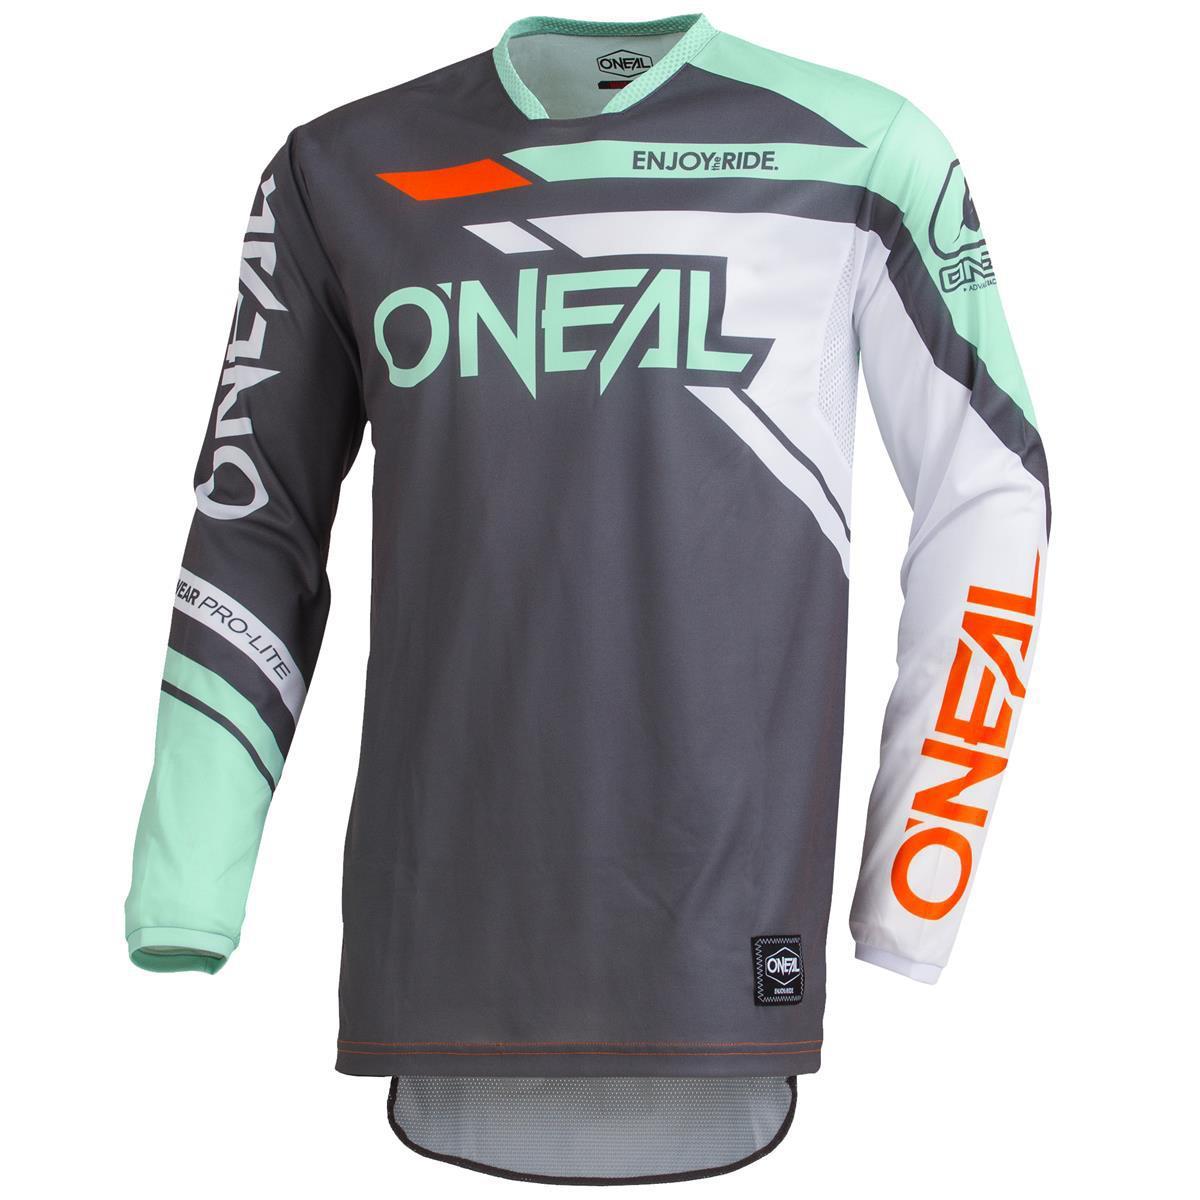 O'Neal Jersey Hardwear Rizer Grau/Mint